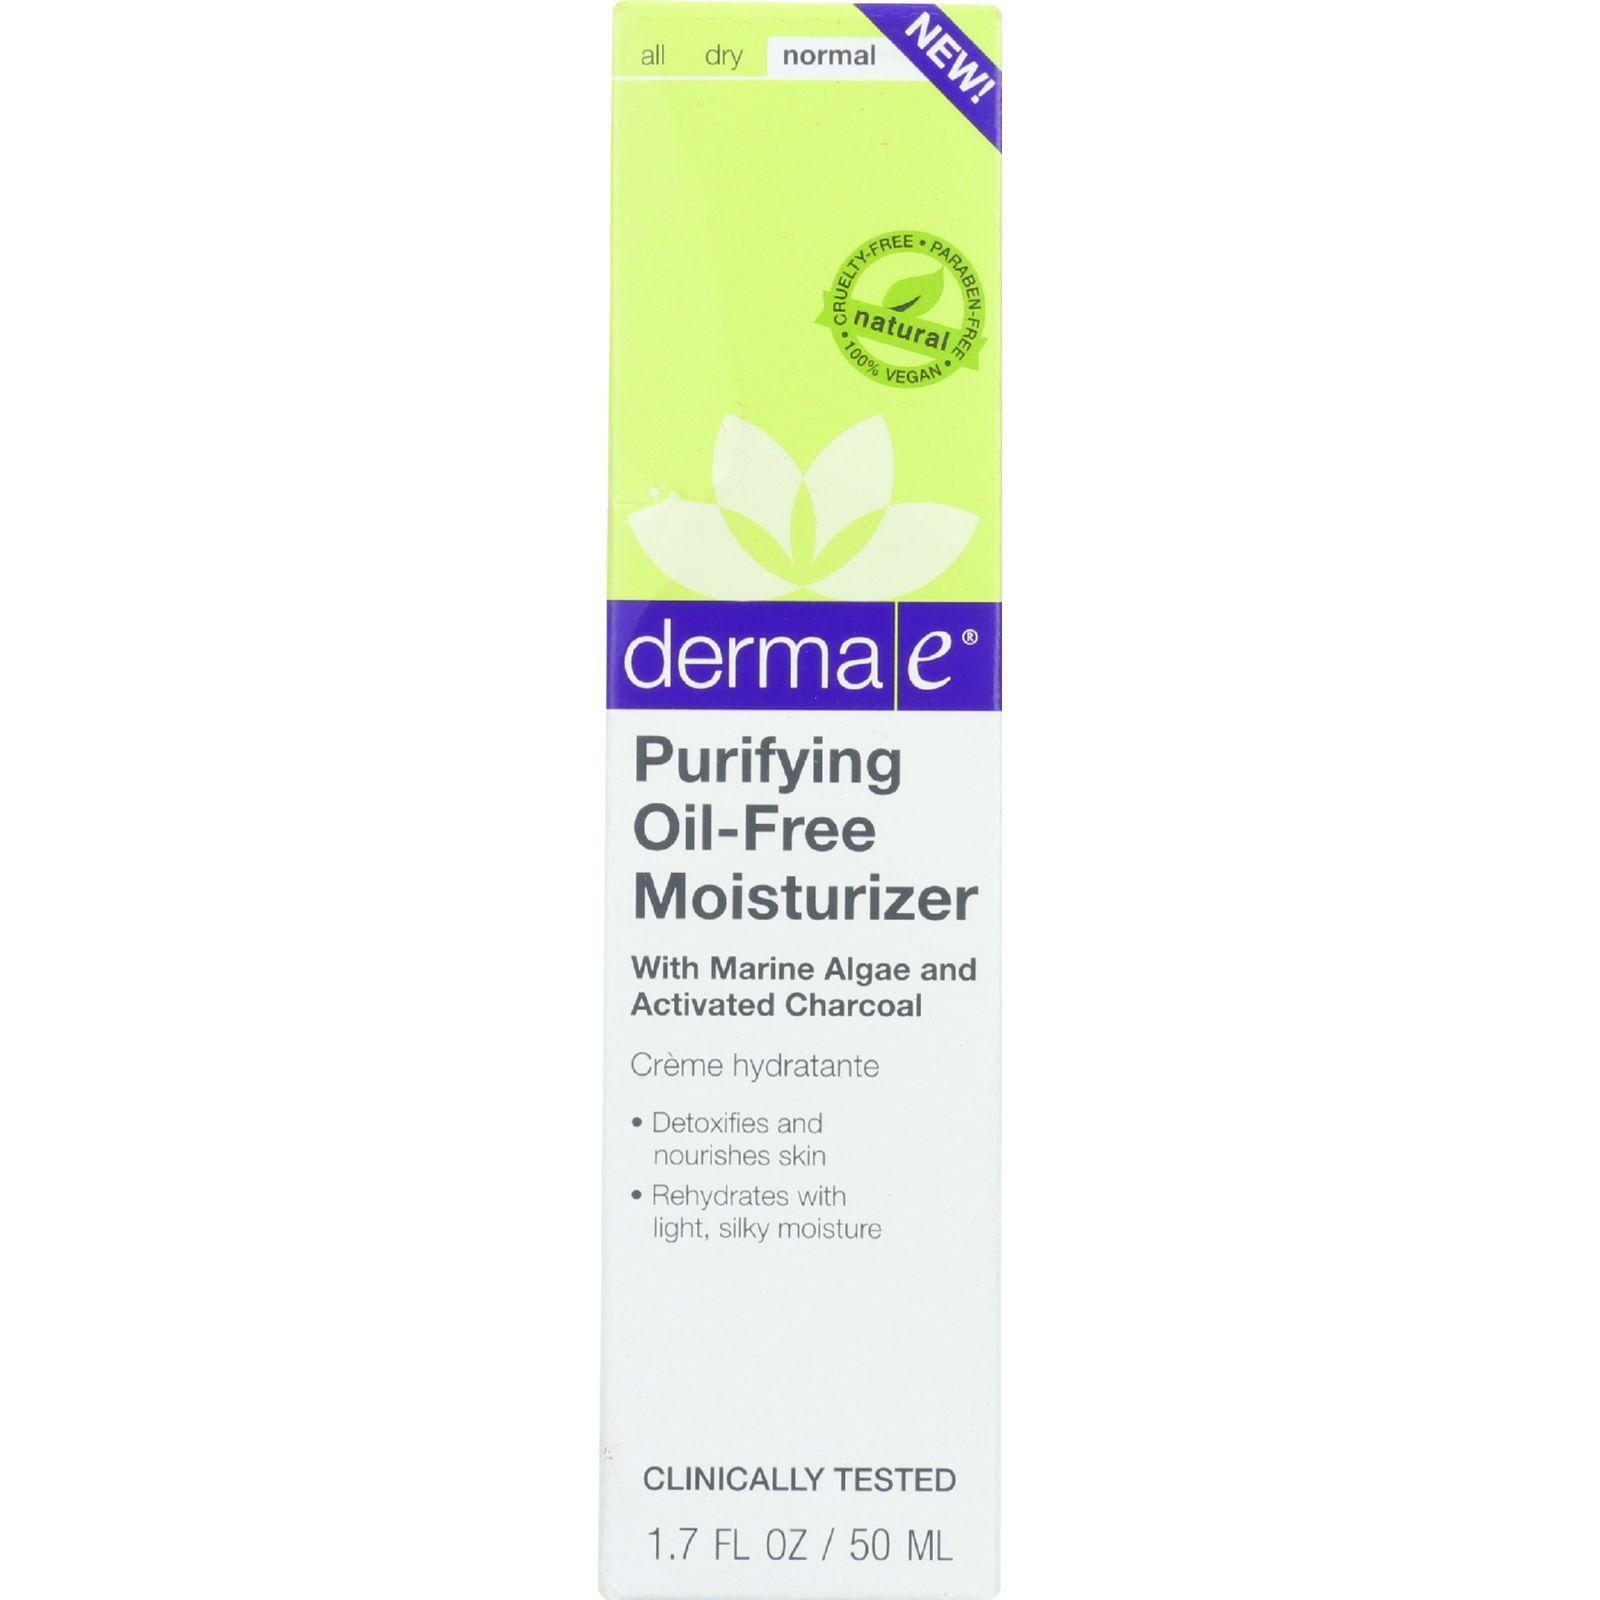 Derma E Moisturizer  Purifying Oil Free  1.7 oz